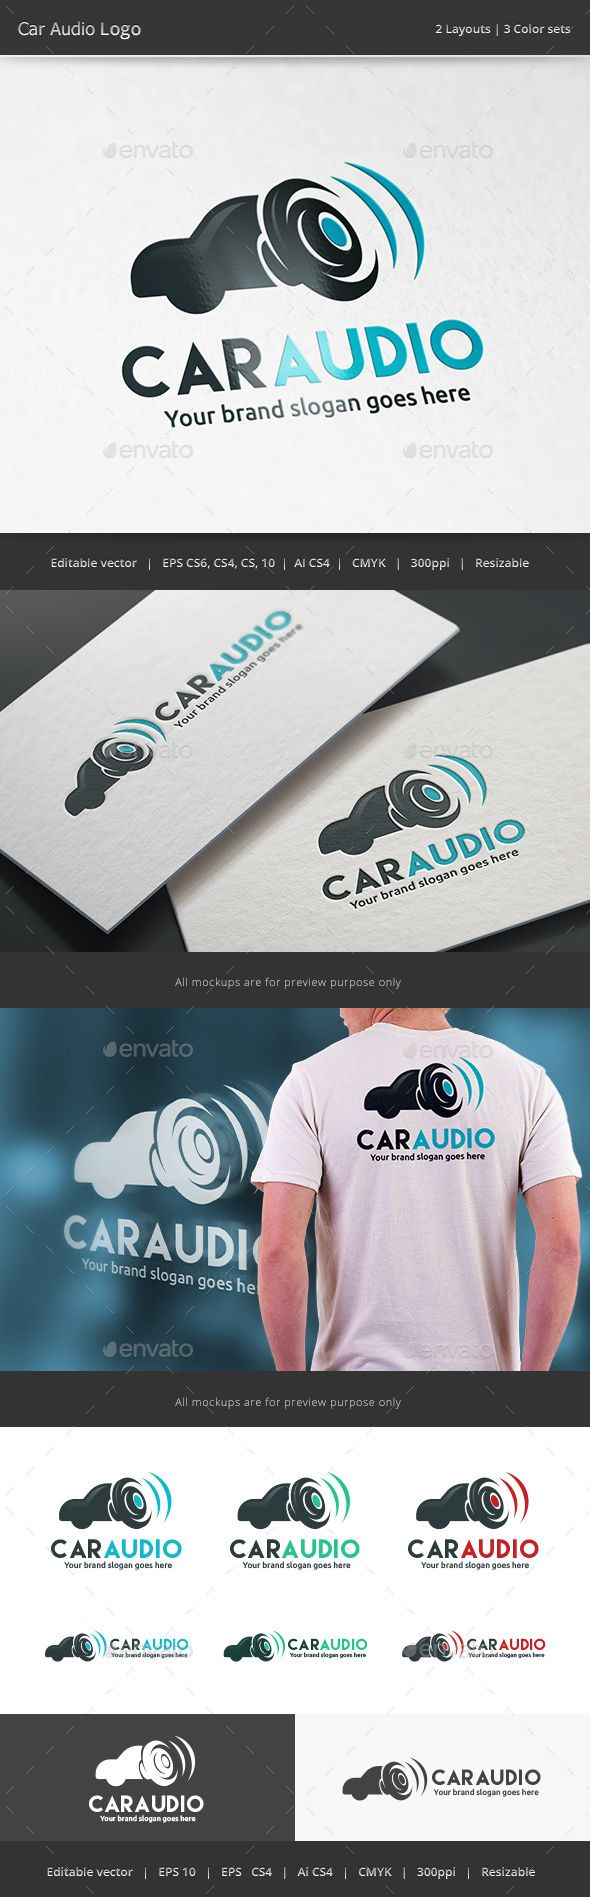 Car Audio  Logo Design Template Vector #logotype Download it here: http://graphicriver.net/item/car-audio-logo/15245613?s_rank=90?ref=nesto